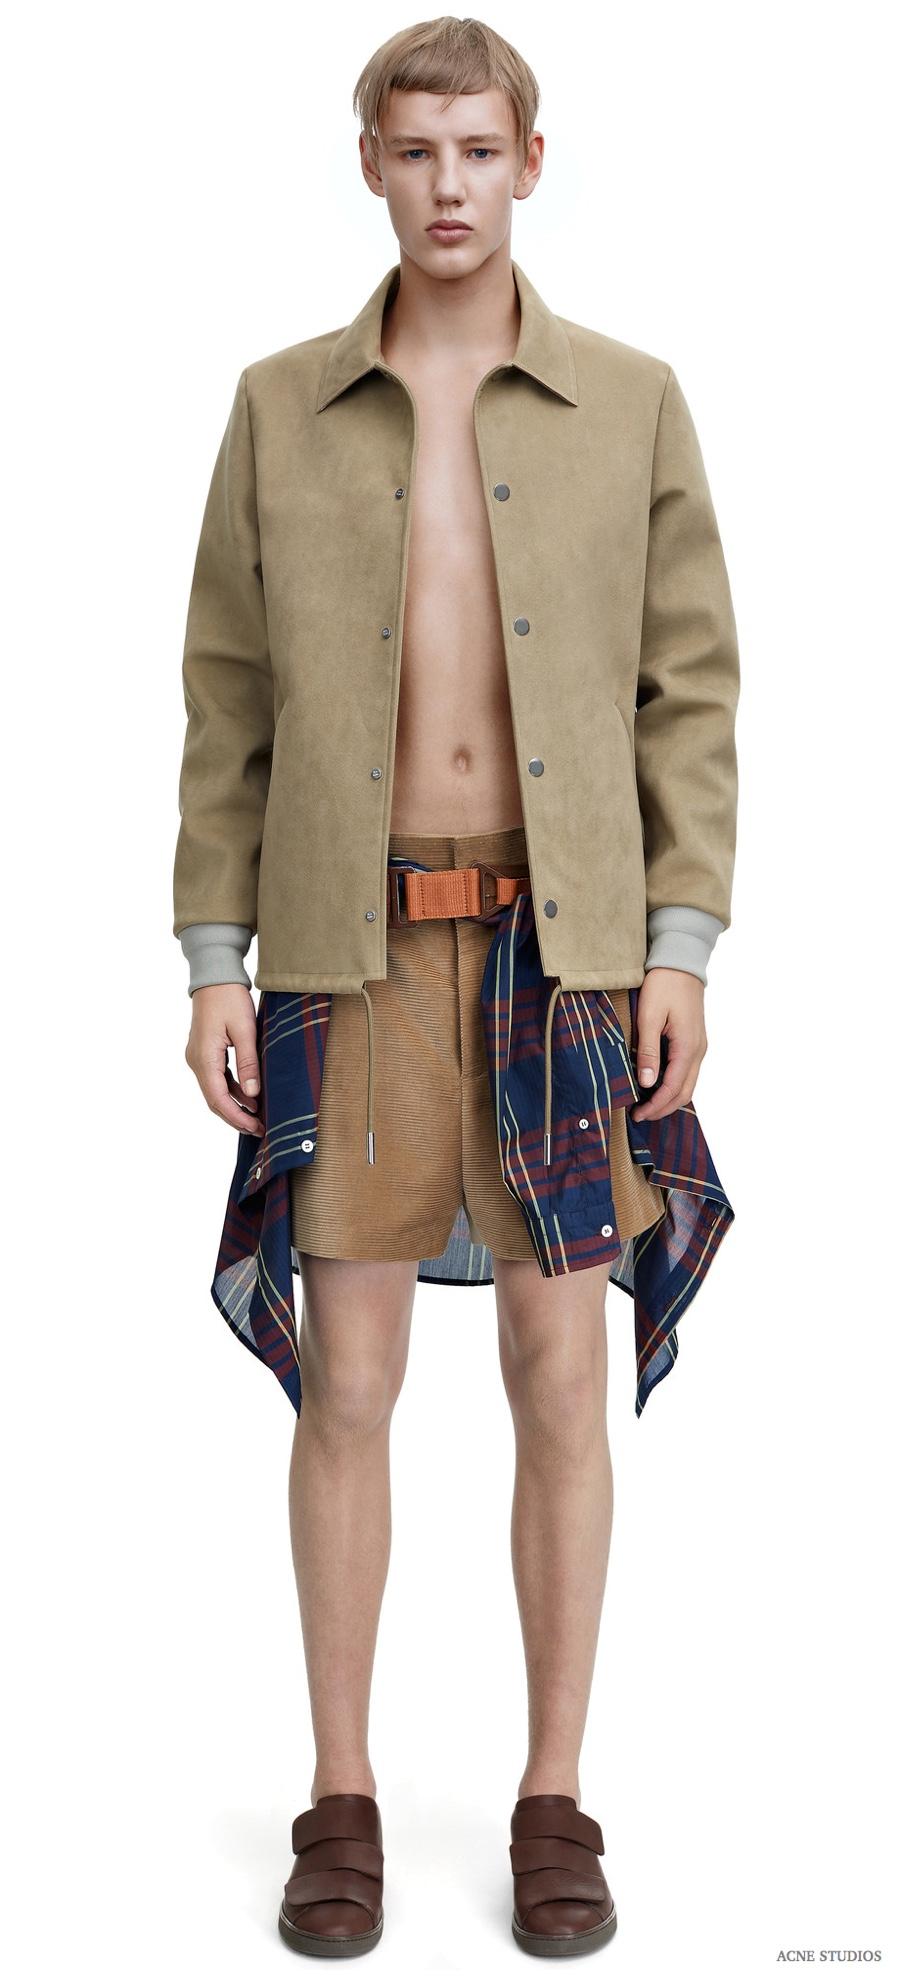 Shop Acne Studios Spring/Summer 2015 Menswear Arrivals